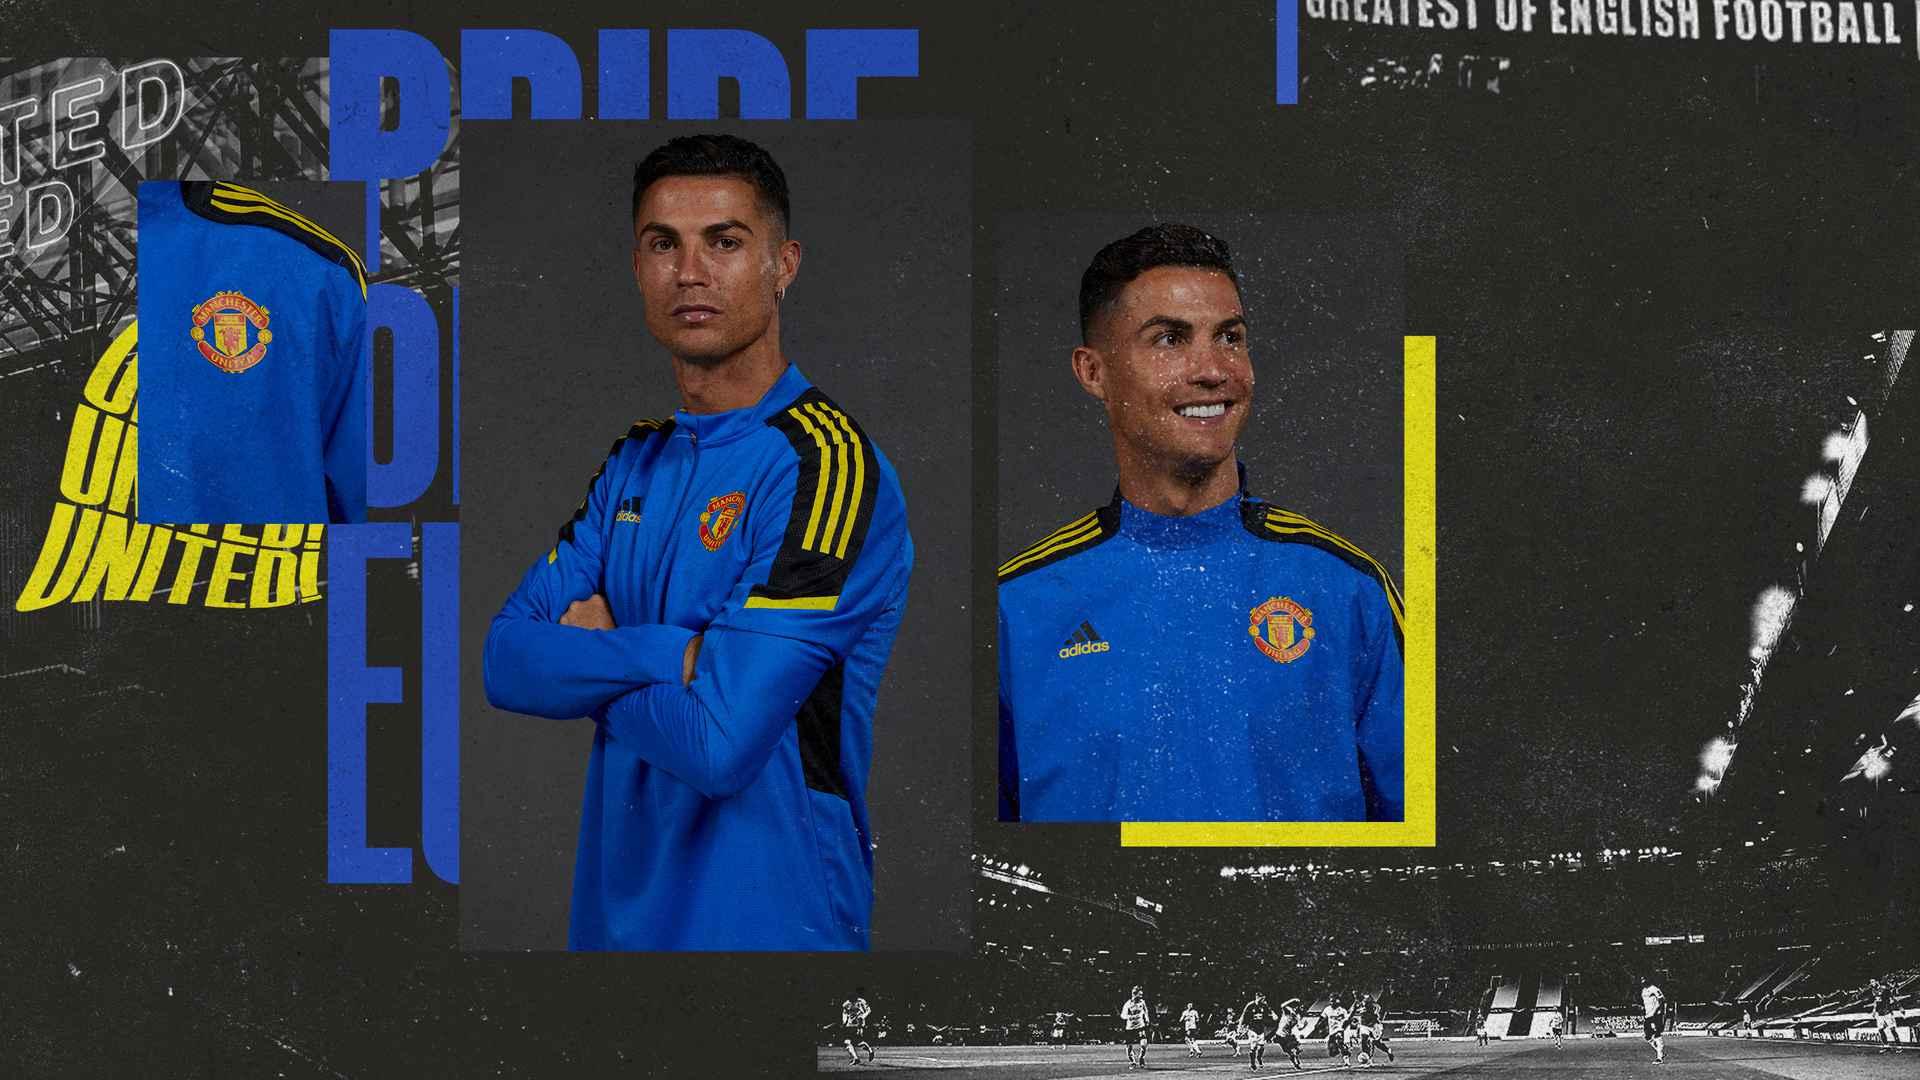 Revealed: Our European training kit for 2021/22 - Manchester United